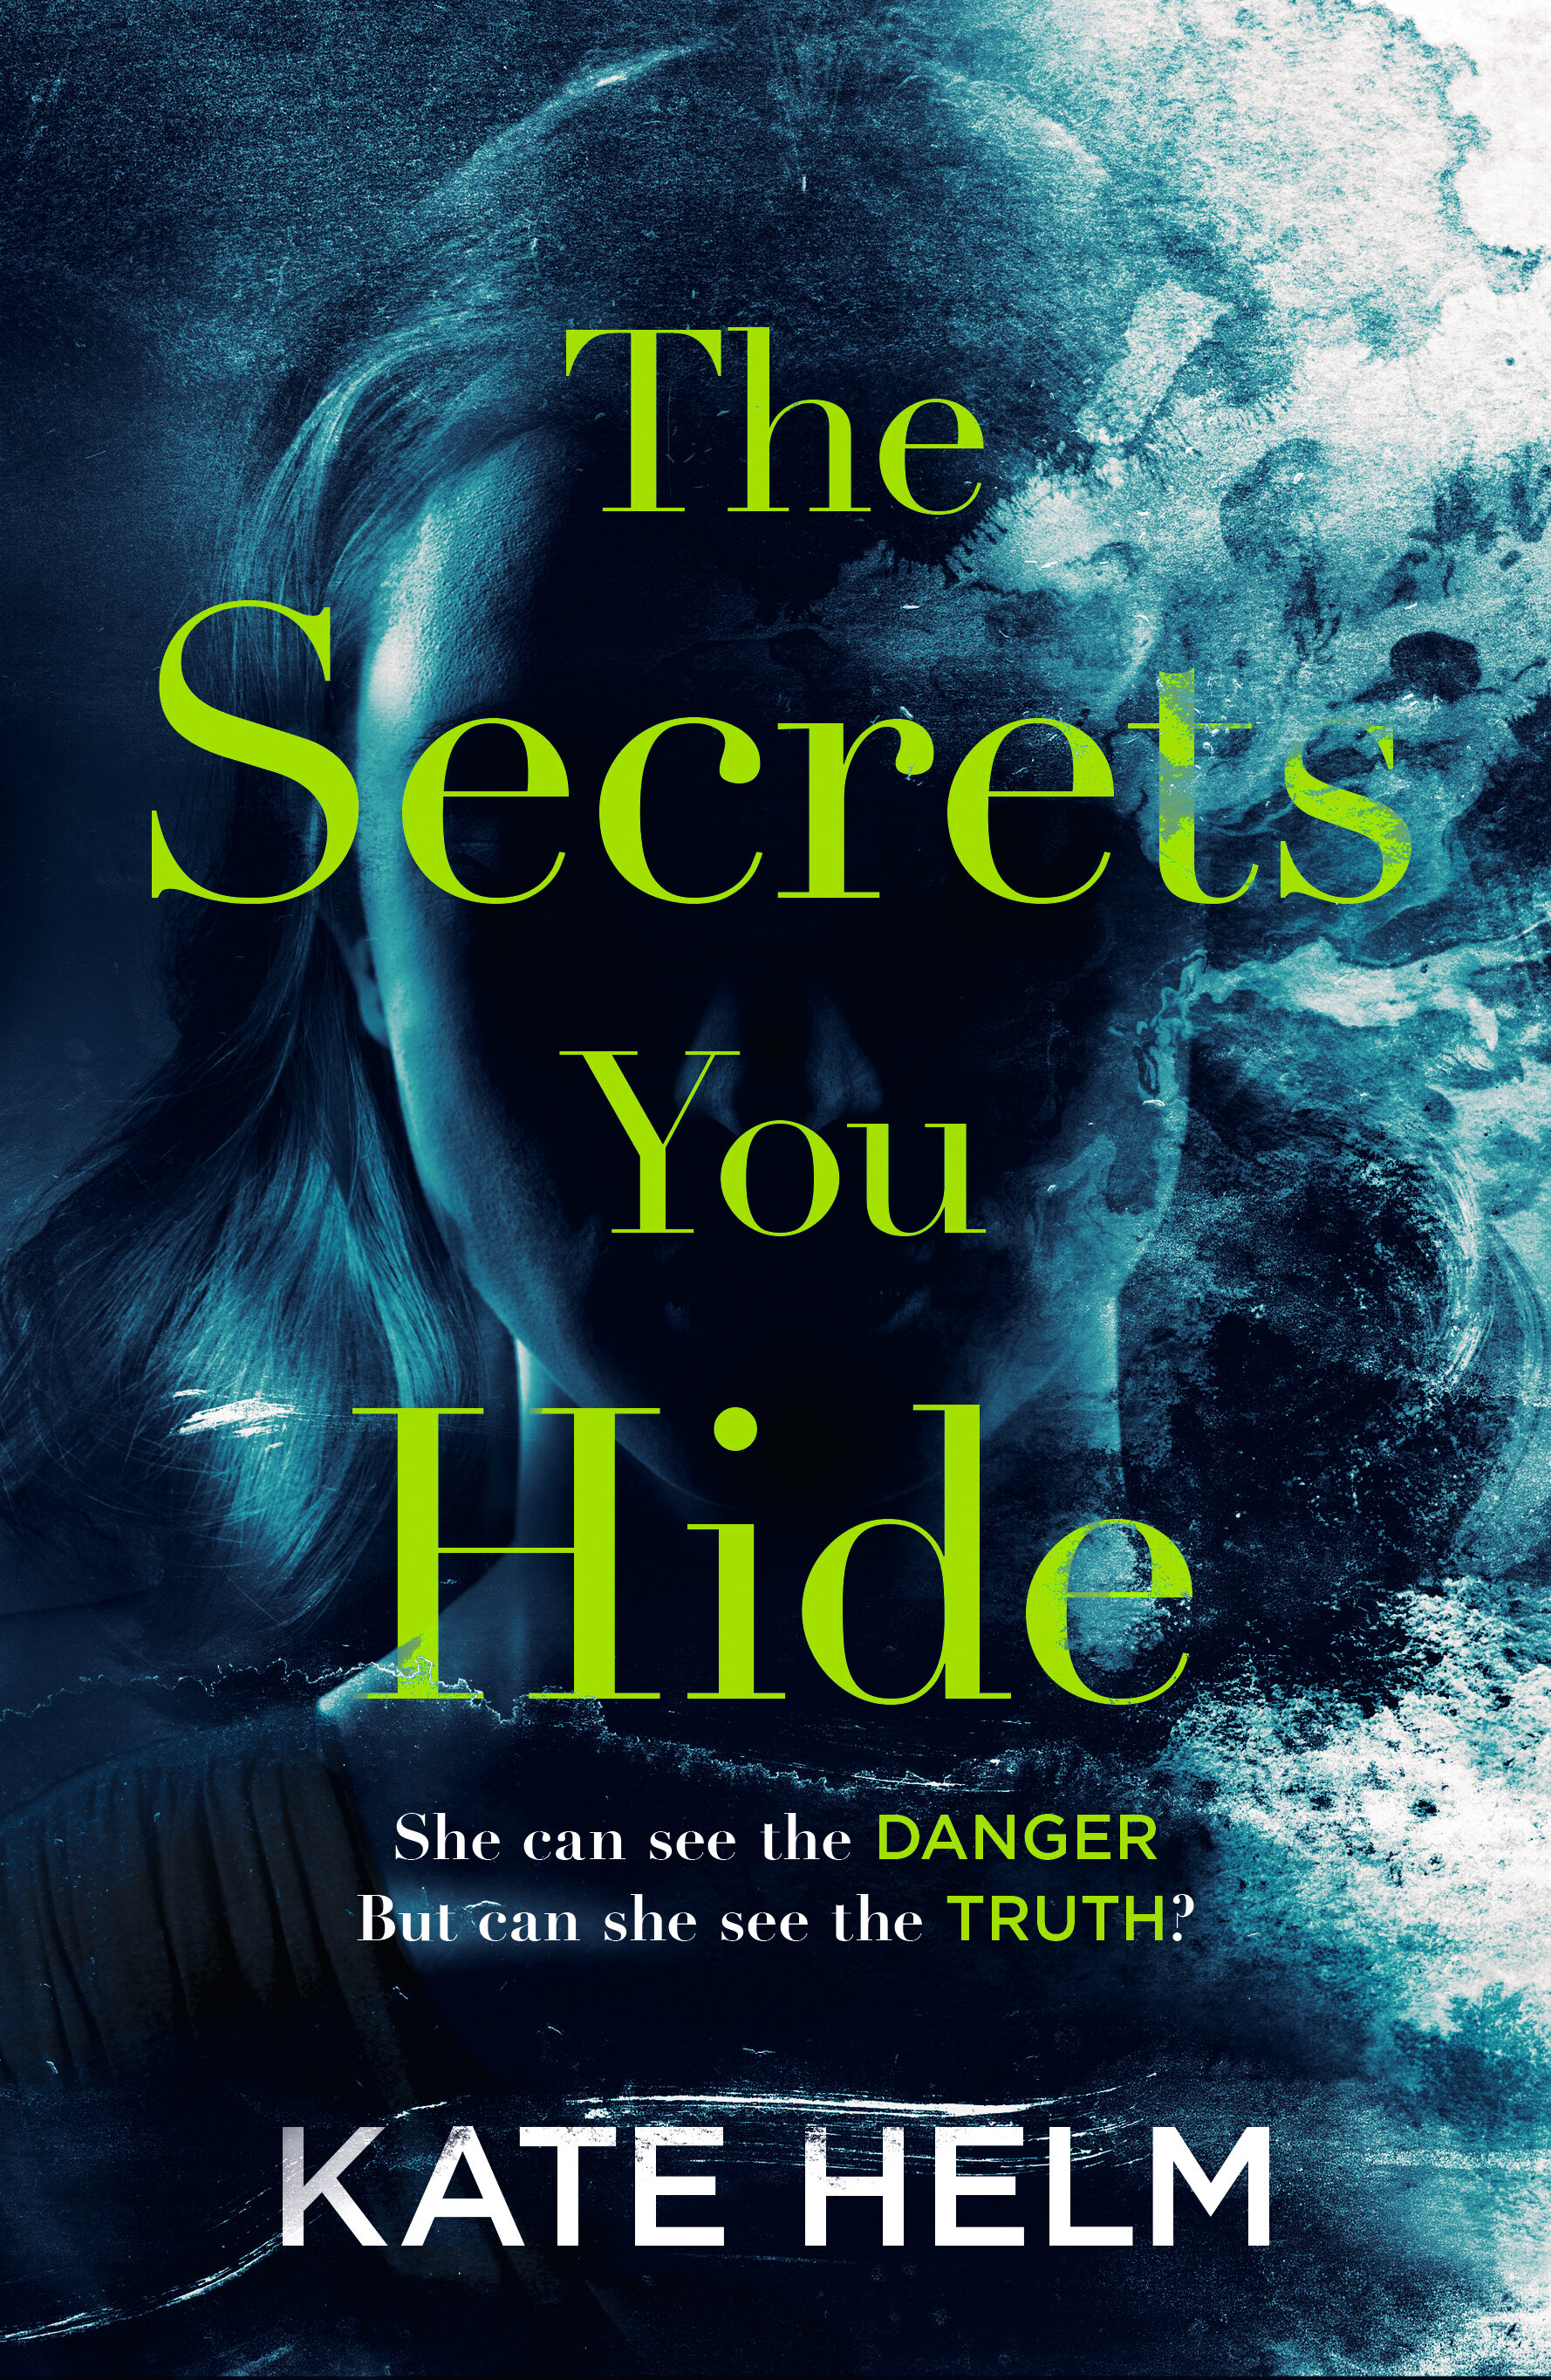 The secrets you hide final cover.jpg